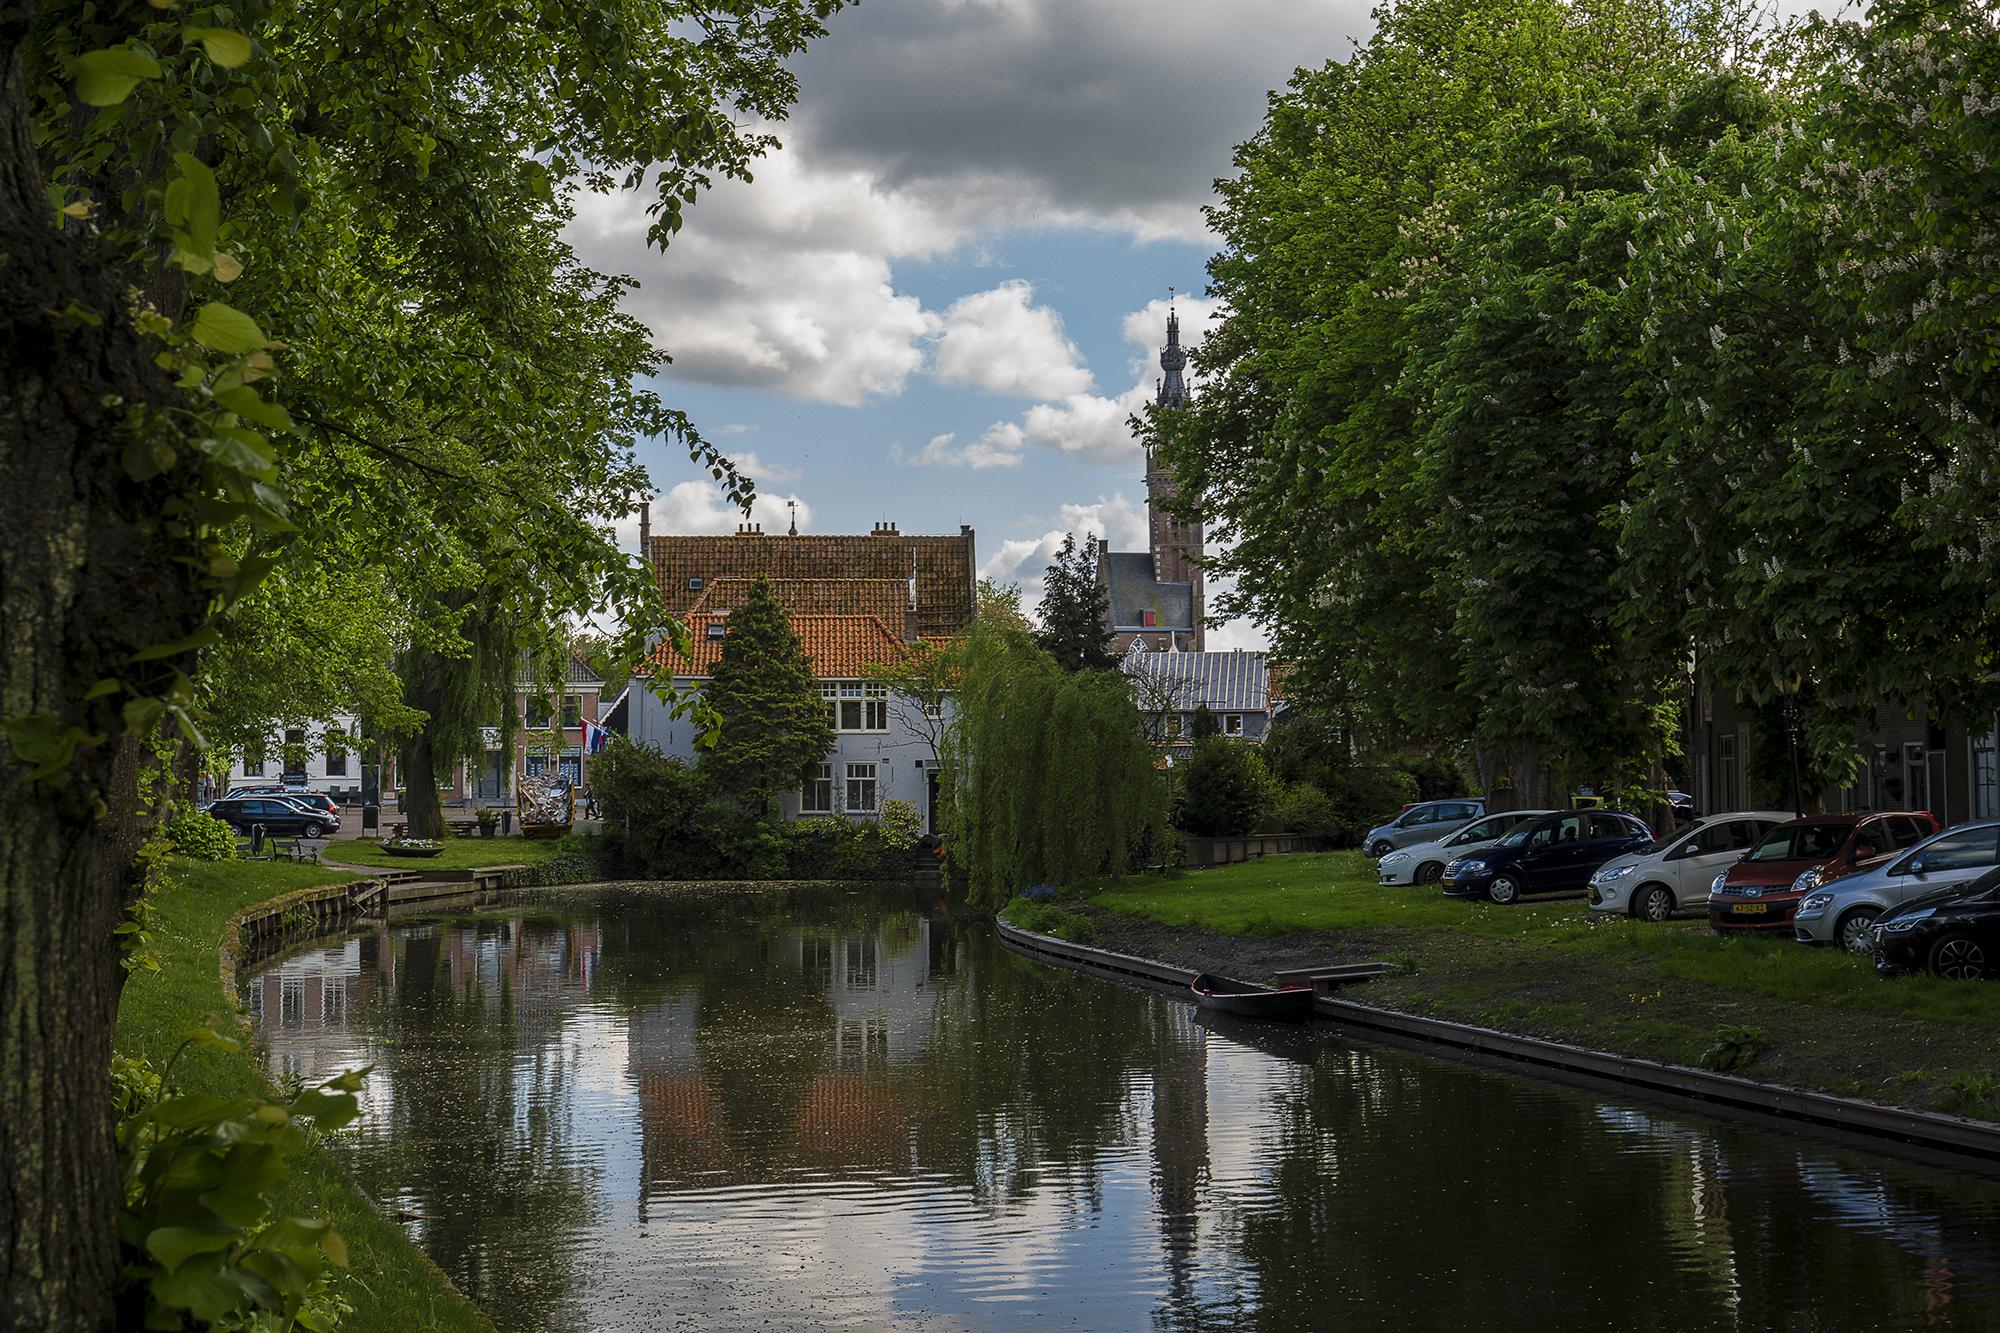 Matthijs Tinxgracht, Edam, Netherlands